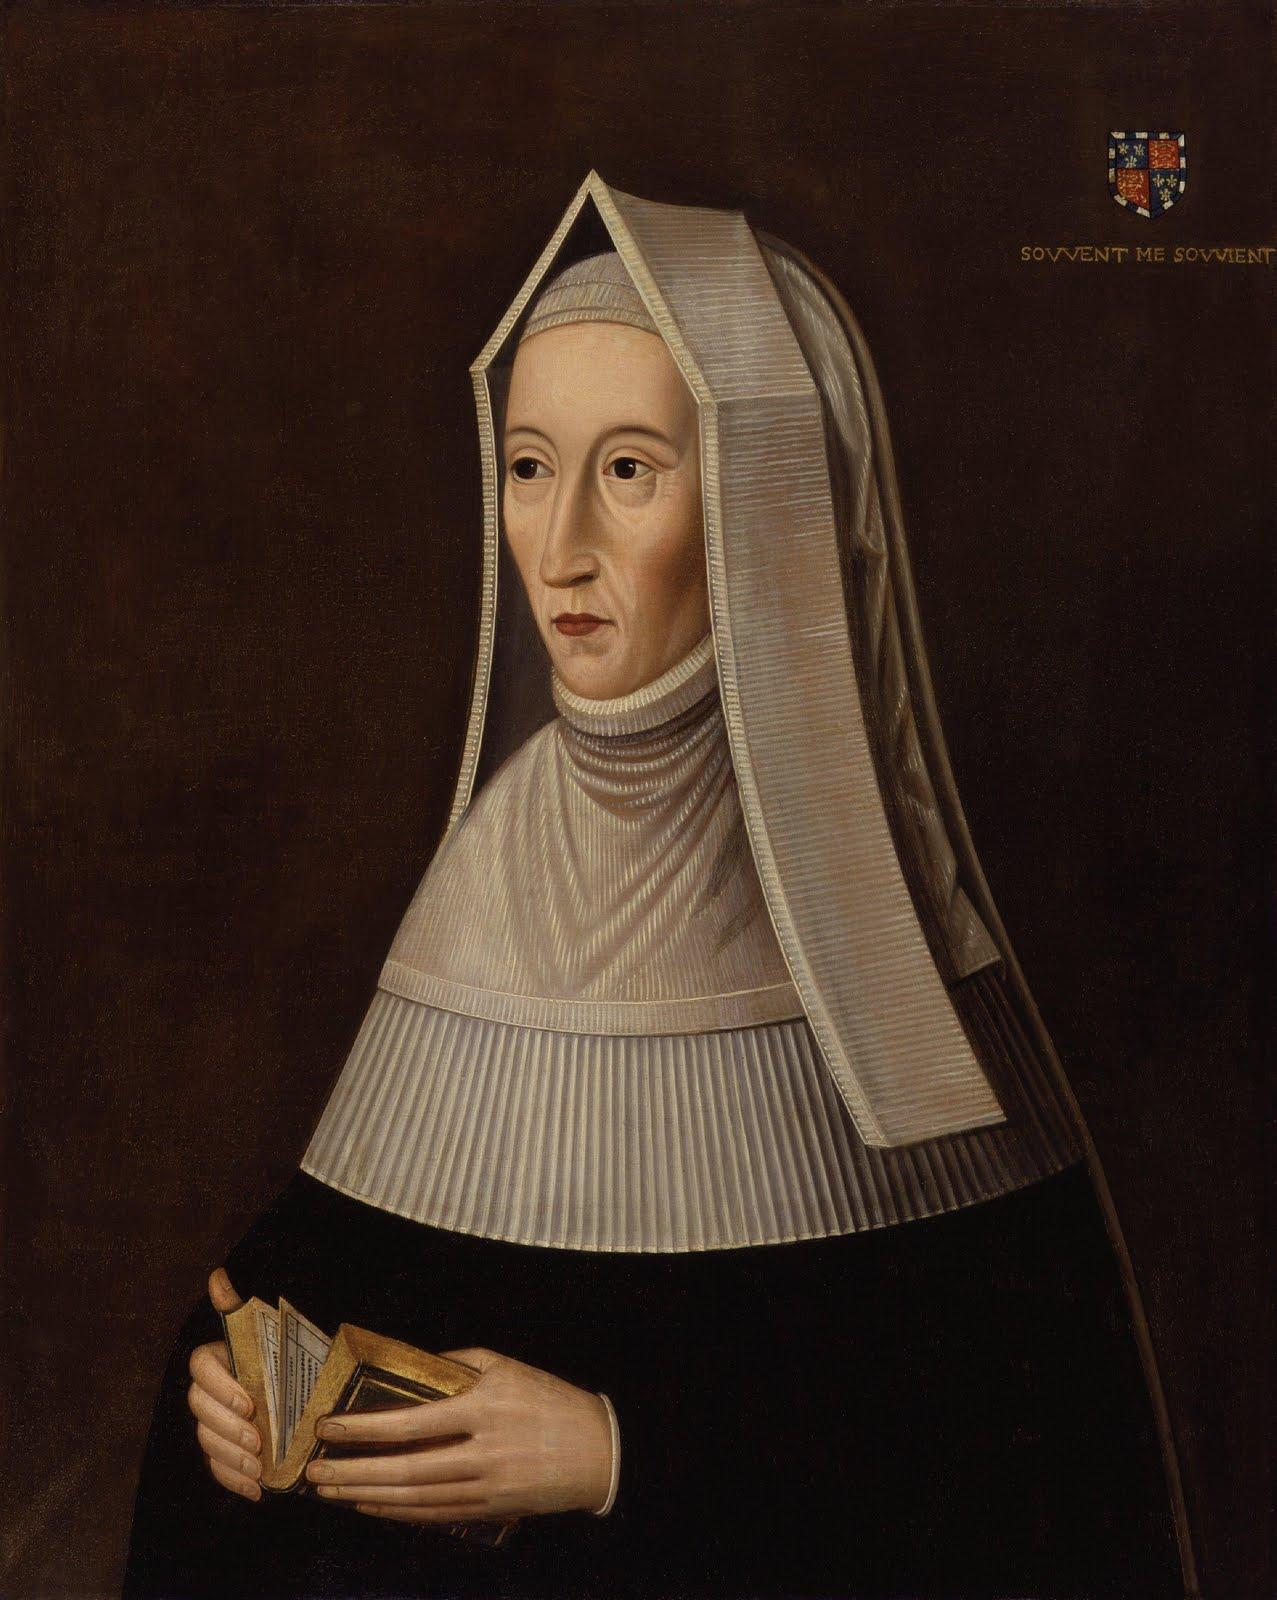 http://1.bp.blogspot.com/_tMZDNkz38ko/TUM6Q3e4RtI/AAAAAAAAASg/IYqcvke8czc/s1600/Lady-Margaret-Beaufort-from-National-Portrait-Gallery.jpg